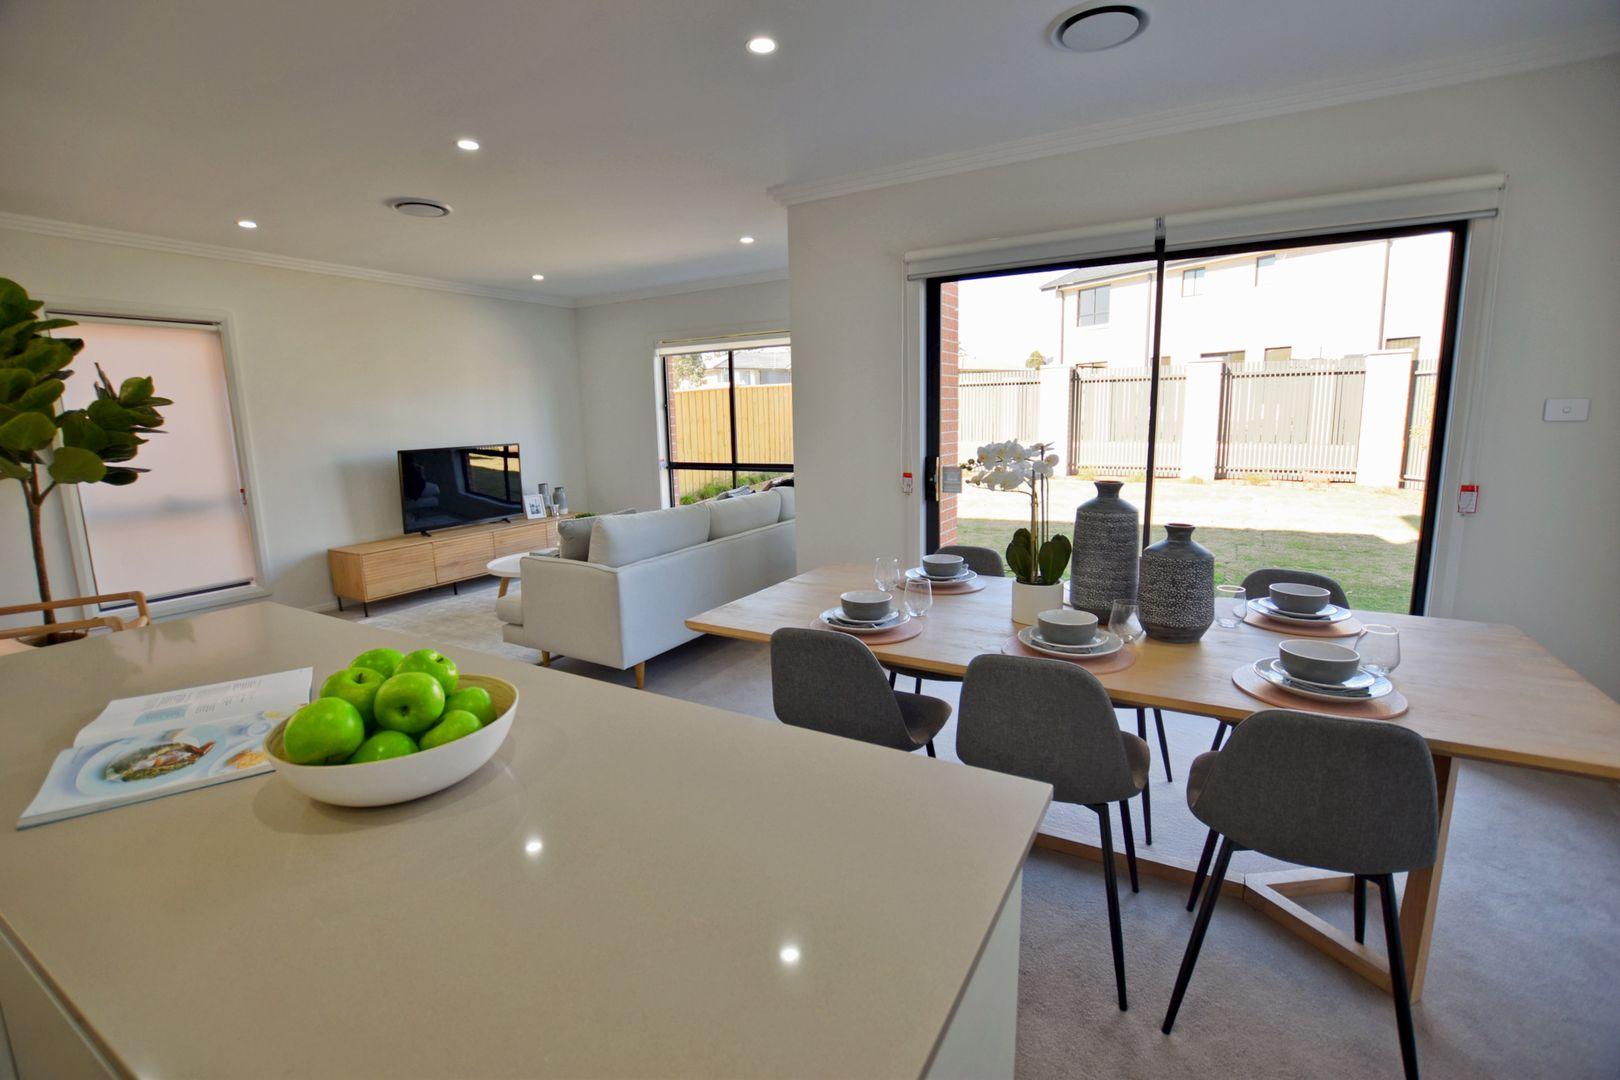 Lot 5116 Jasper St, Bonnyrigg NSW 2177, Image 1